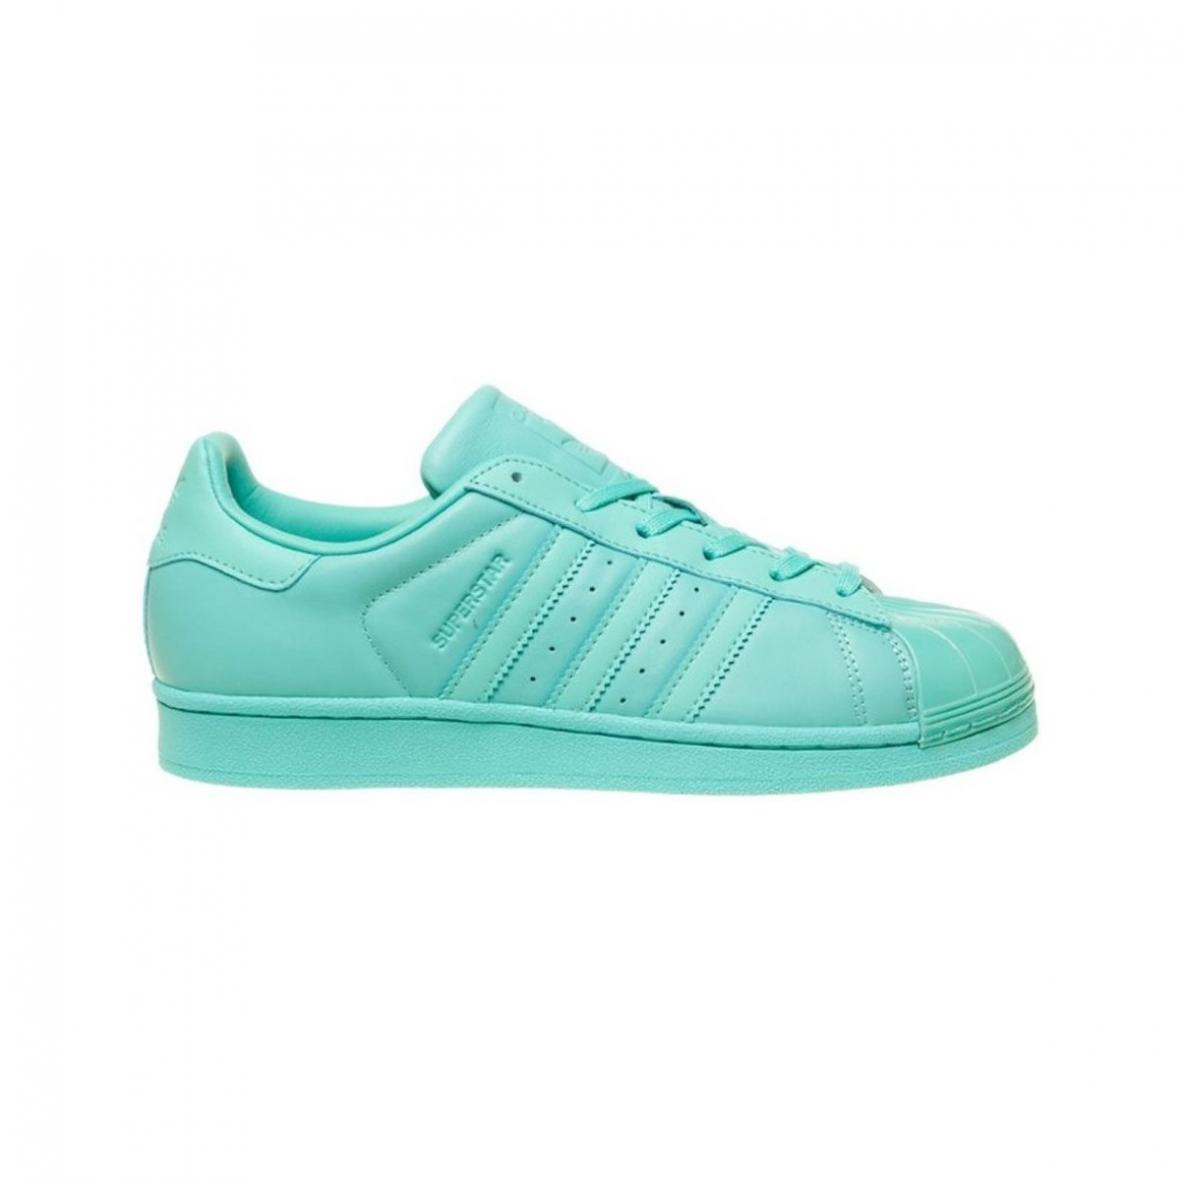 Baskets mode Adidas Originals | Superstar Glossy Toe Turquoise ...